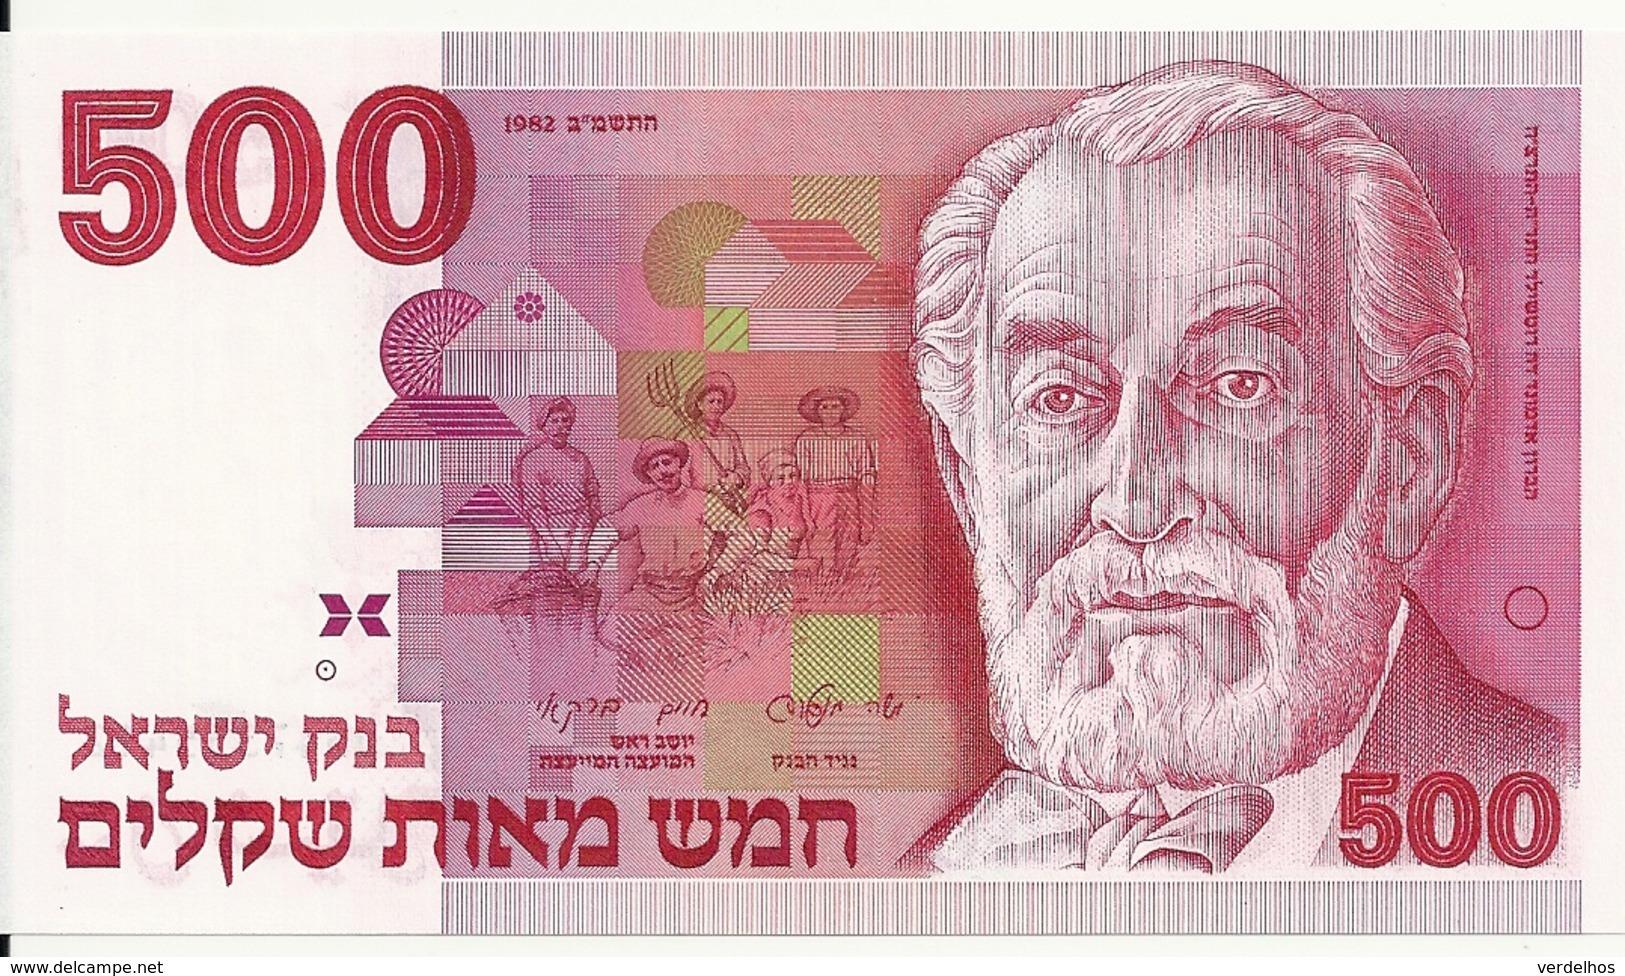 ISRAEL 500 SHEQALIM 1982 UNC P 48 - Israël